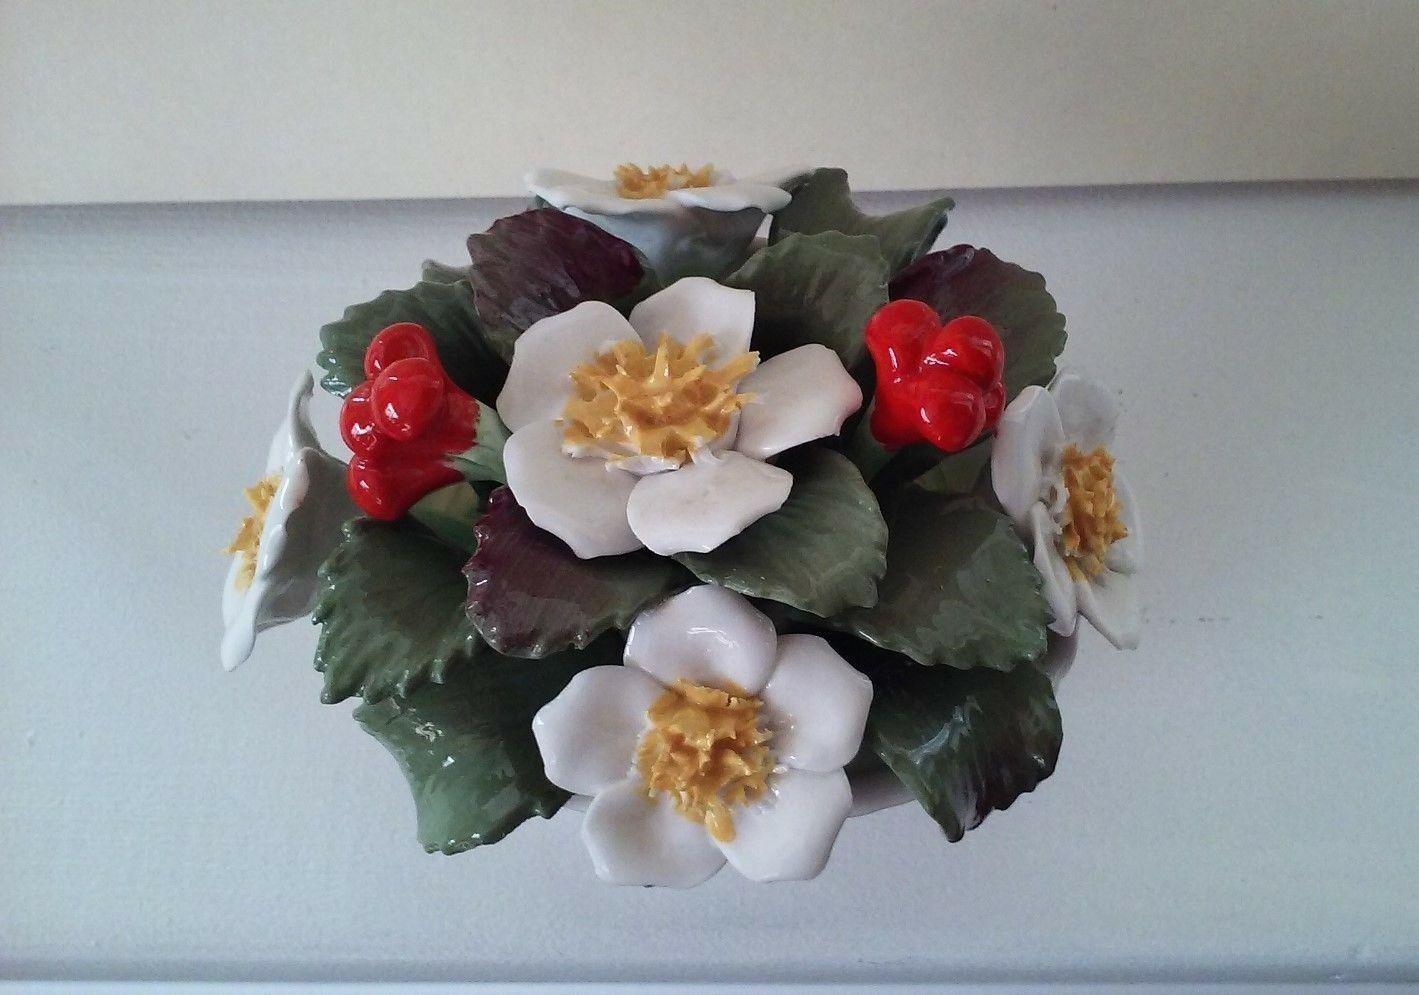 Vintage Aynsley Bone China December Christmas Rose Basket hand painted bouquet image 7